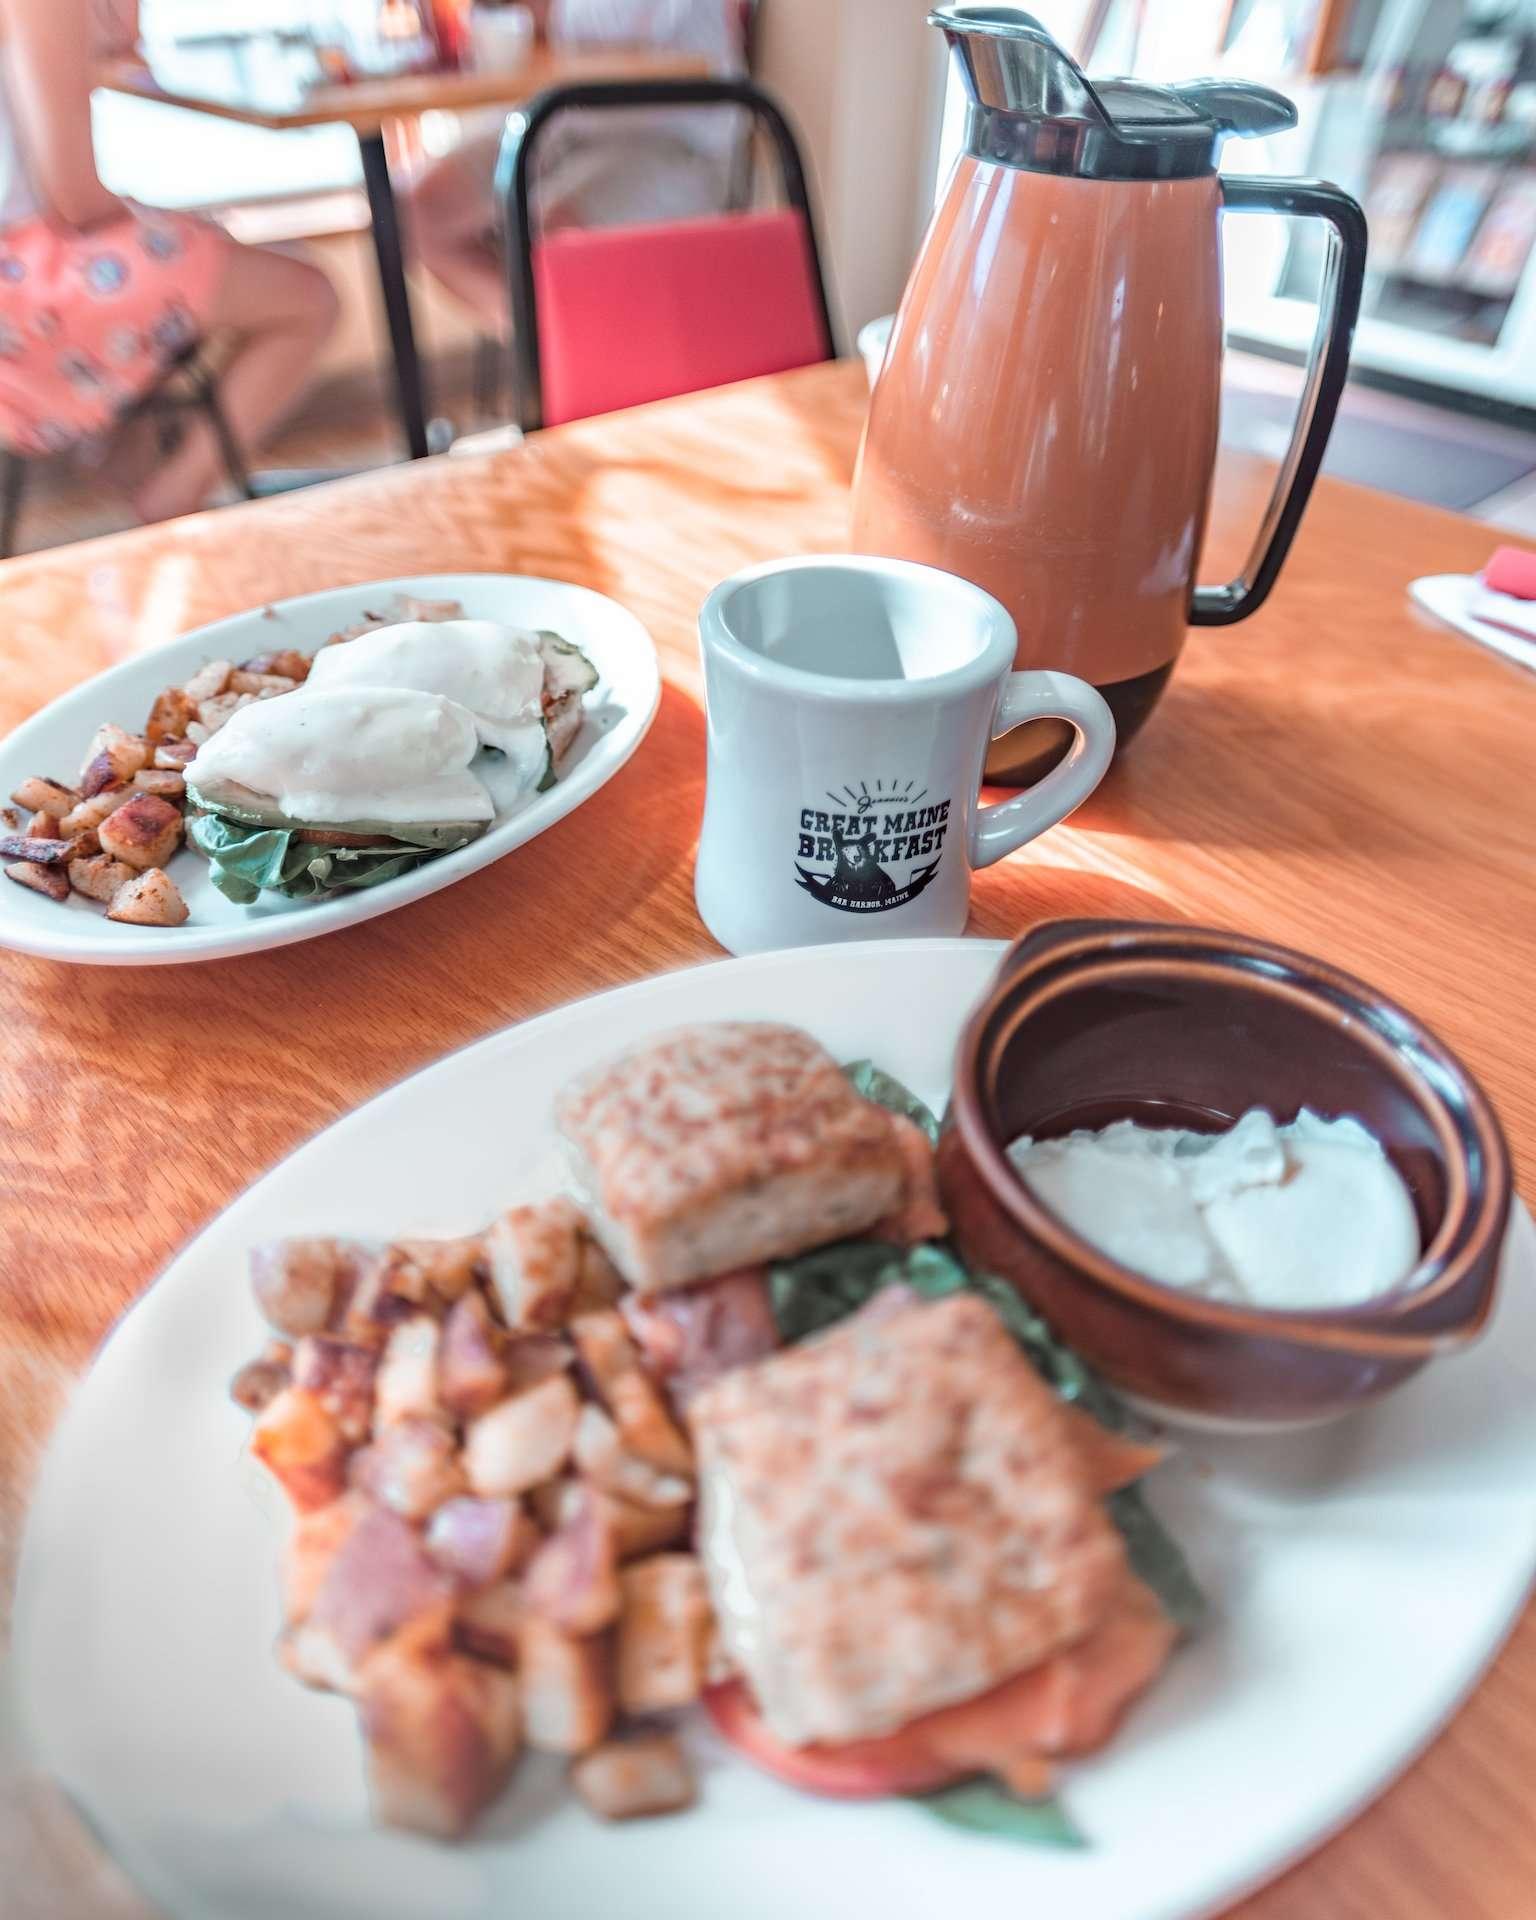 Jeannie's Great Maine Breakfast